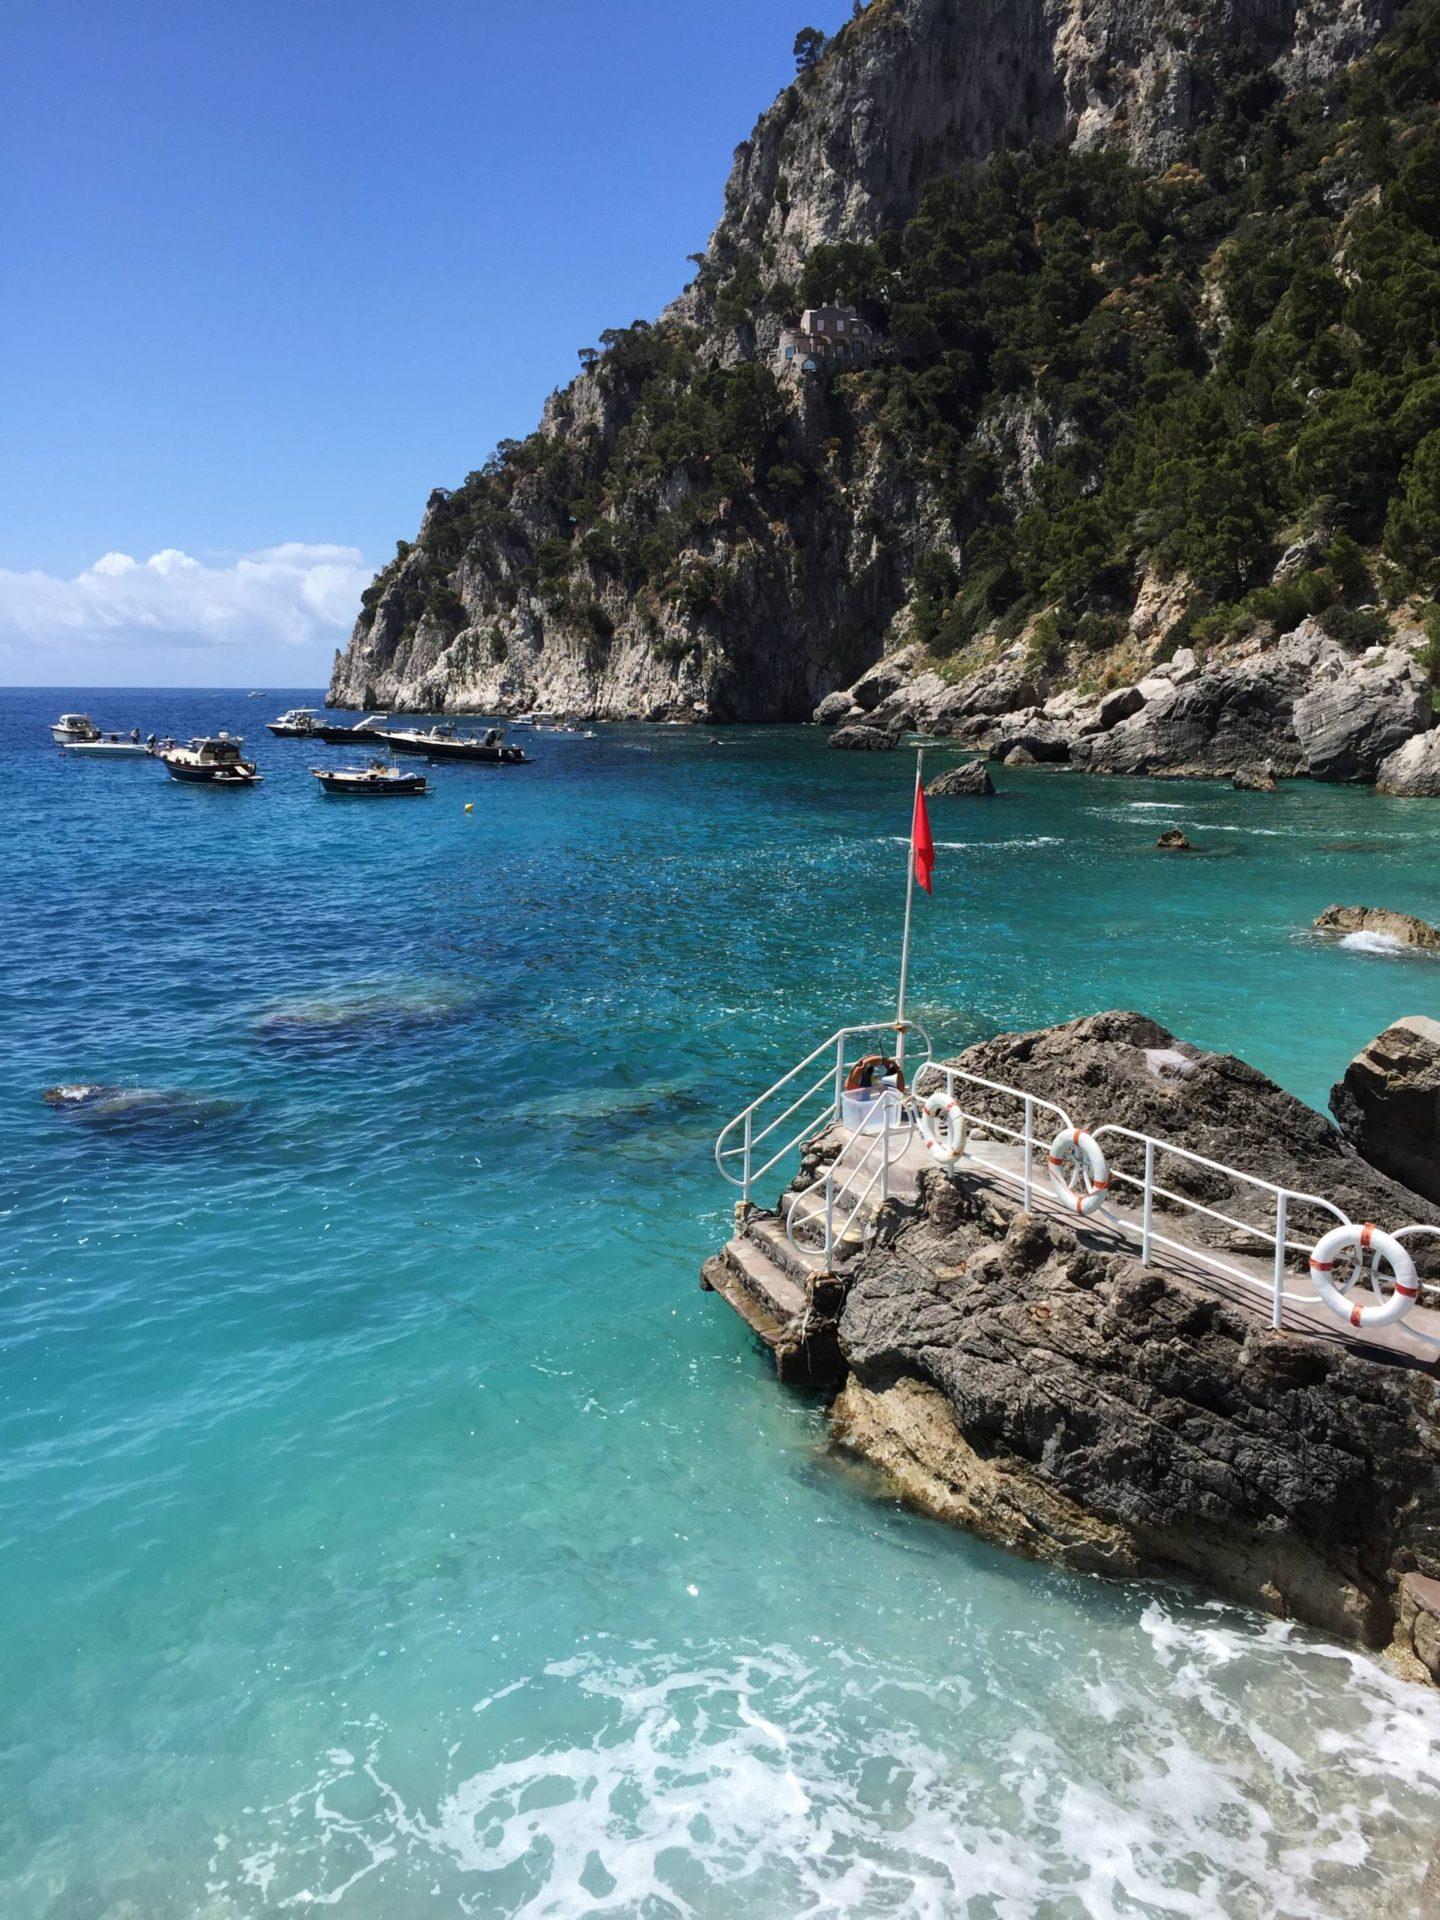 Emma Victorian Stokes Boat Tour Capri Beach Marina Piccola